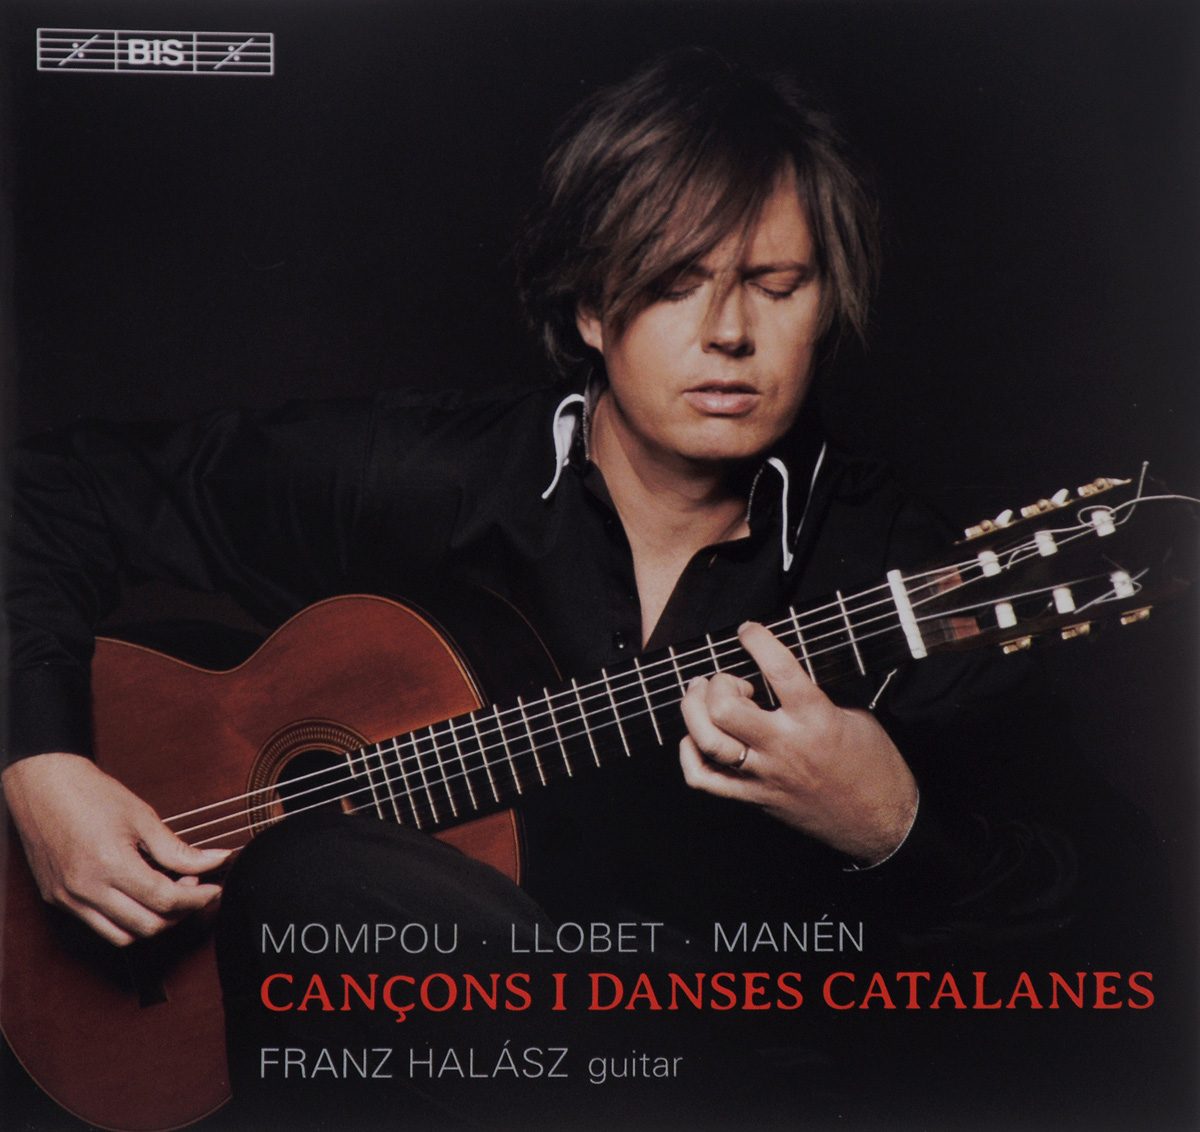 Franz Halasz. Mompou / Llobet / Manen. Cancons I Danses Catalanes (SACD)